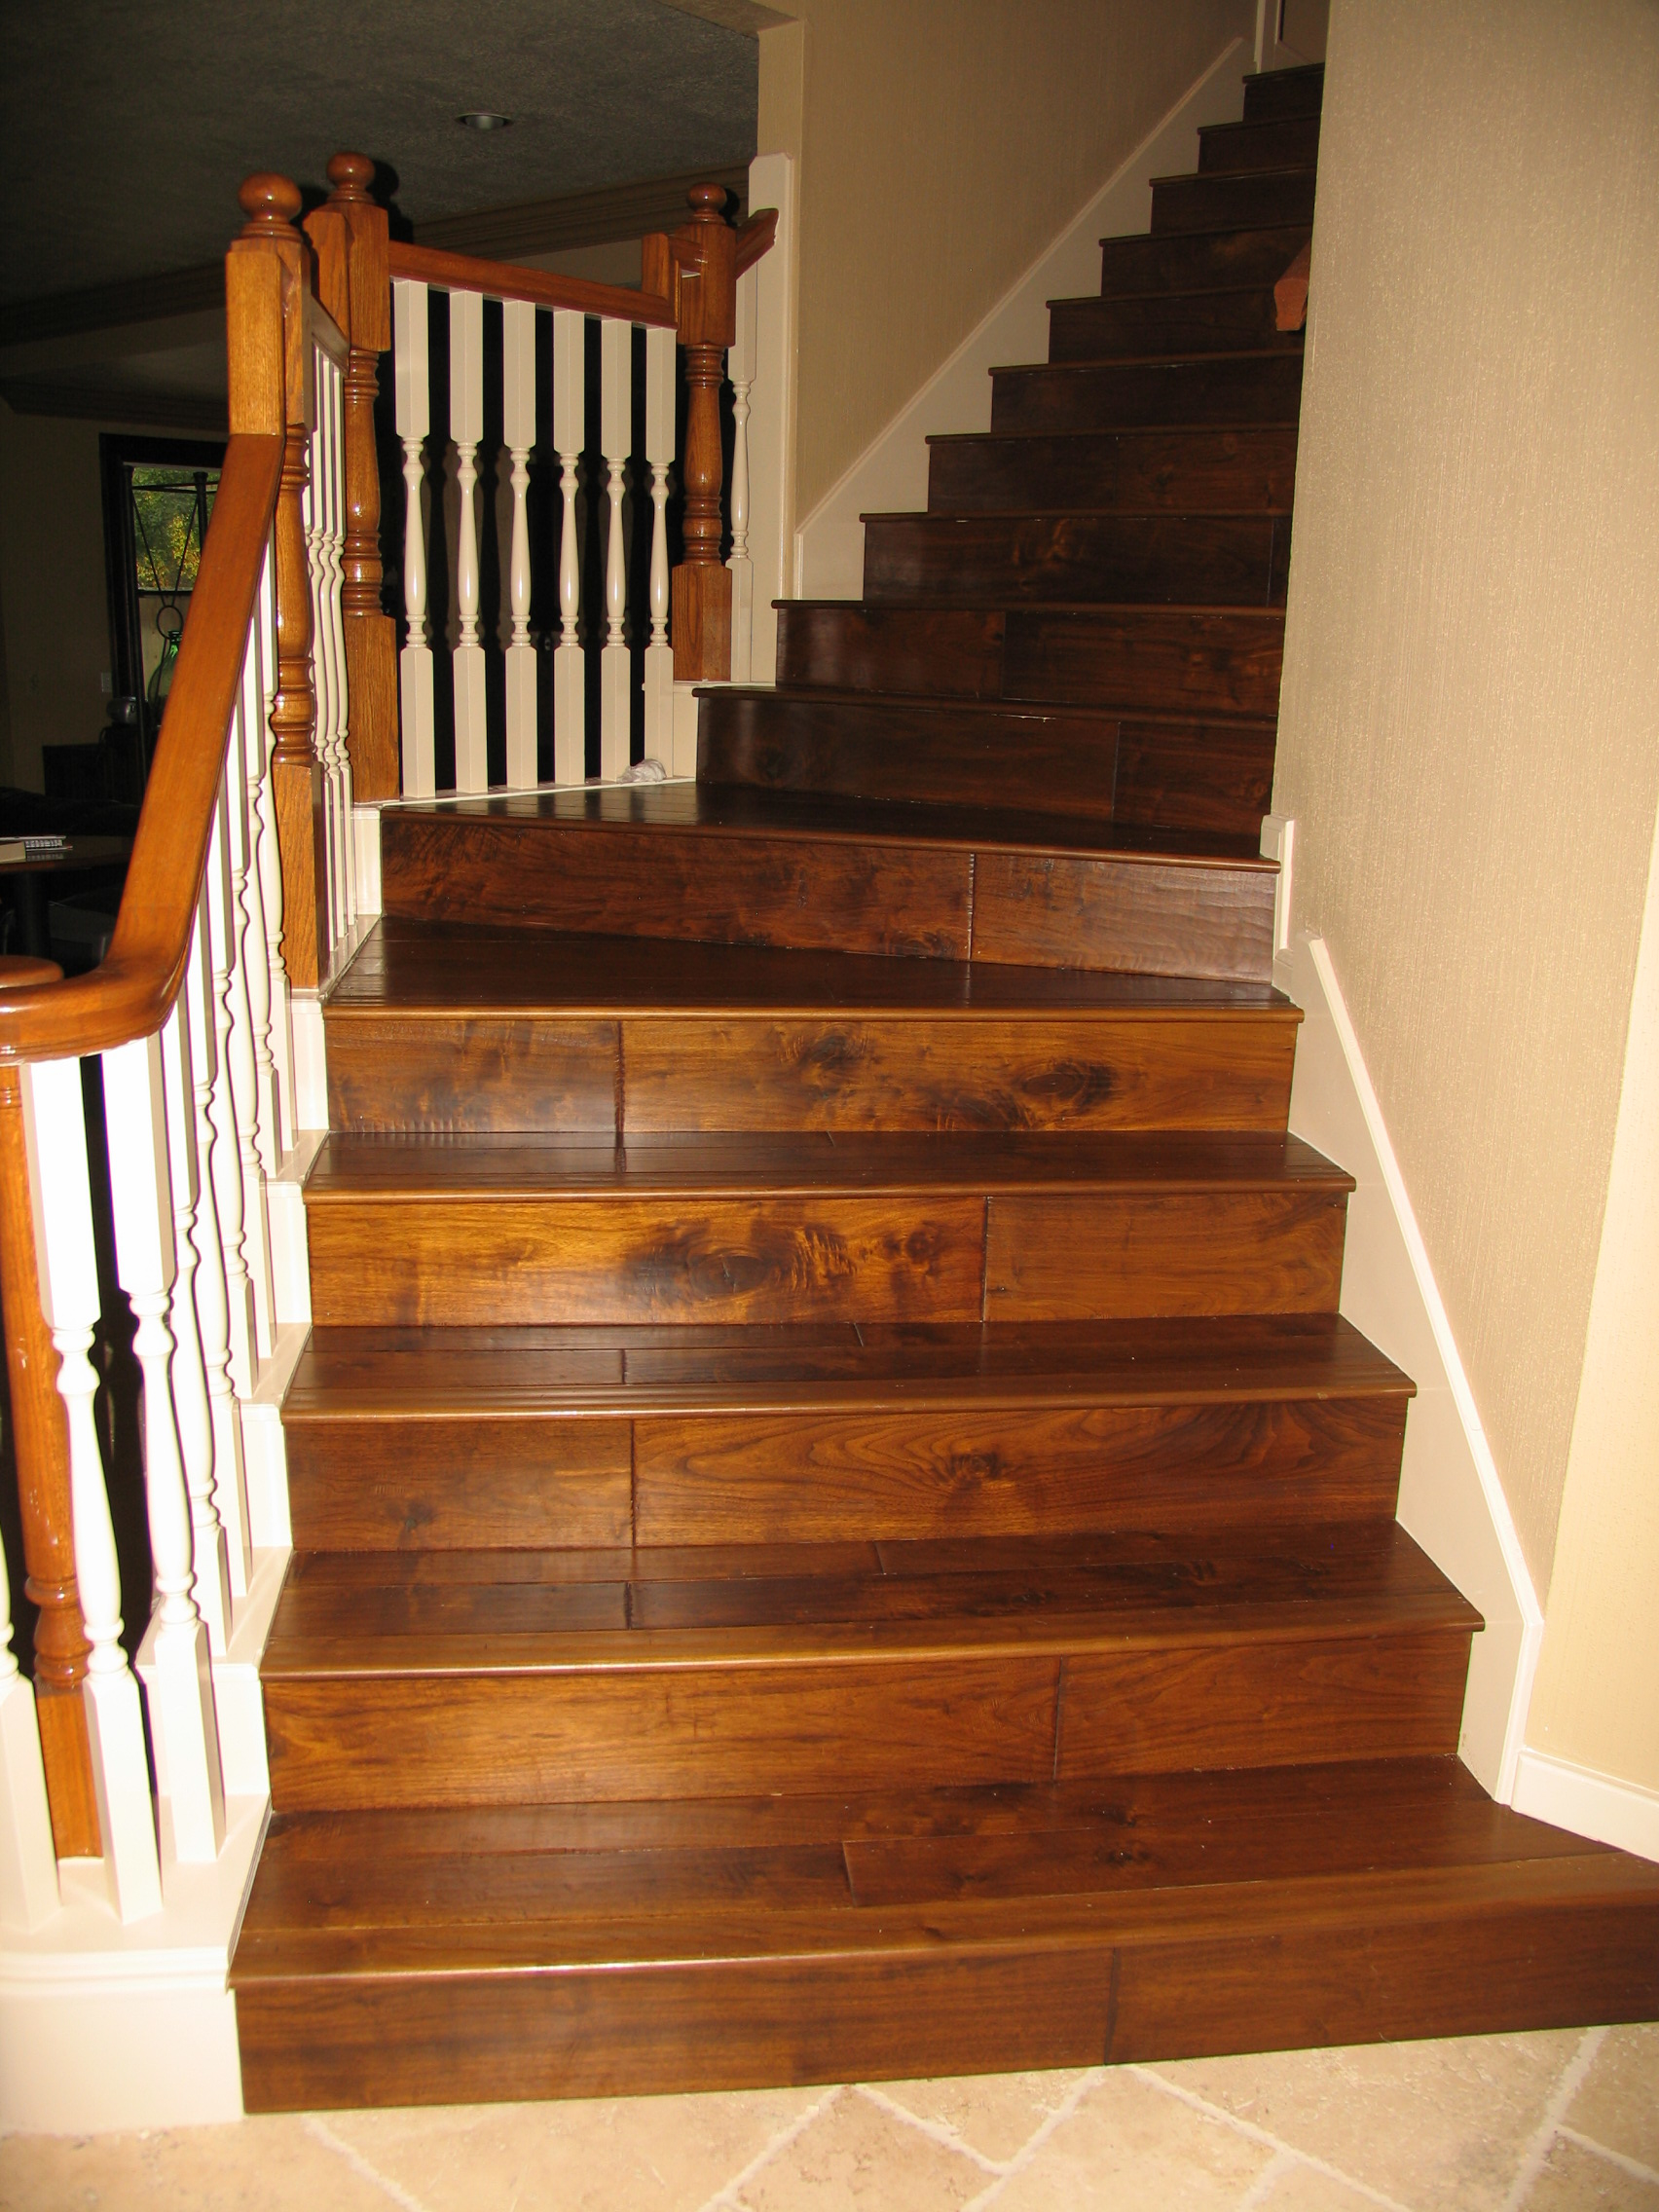 Katy carpets etc in katy tx 77450 for Hardwood flooring 77450